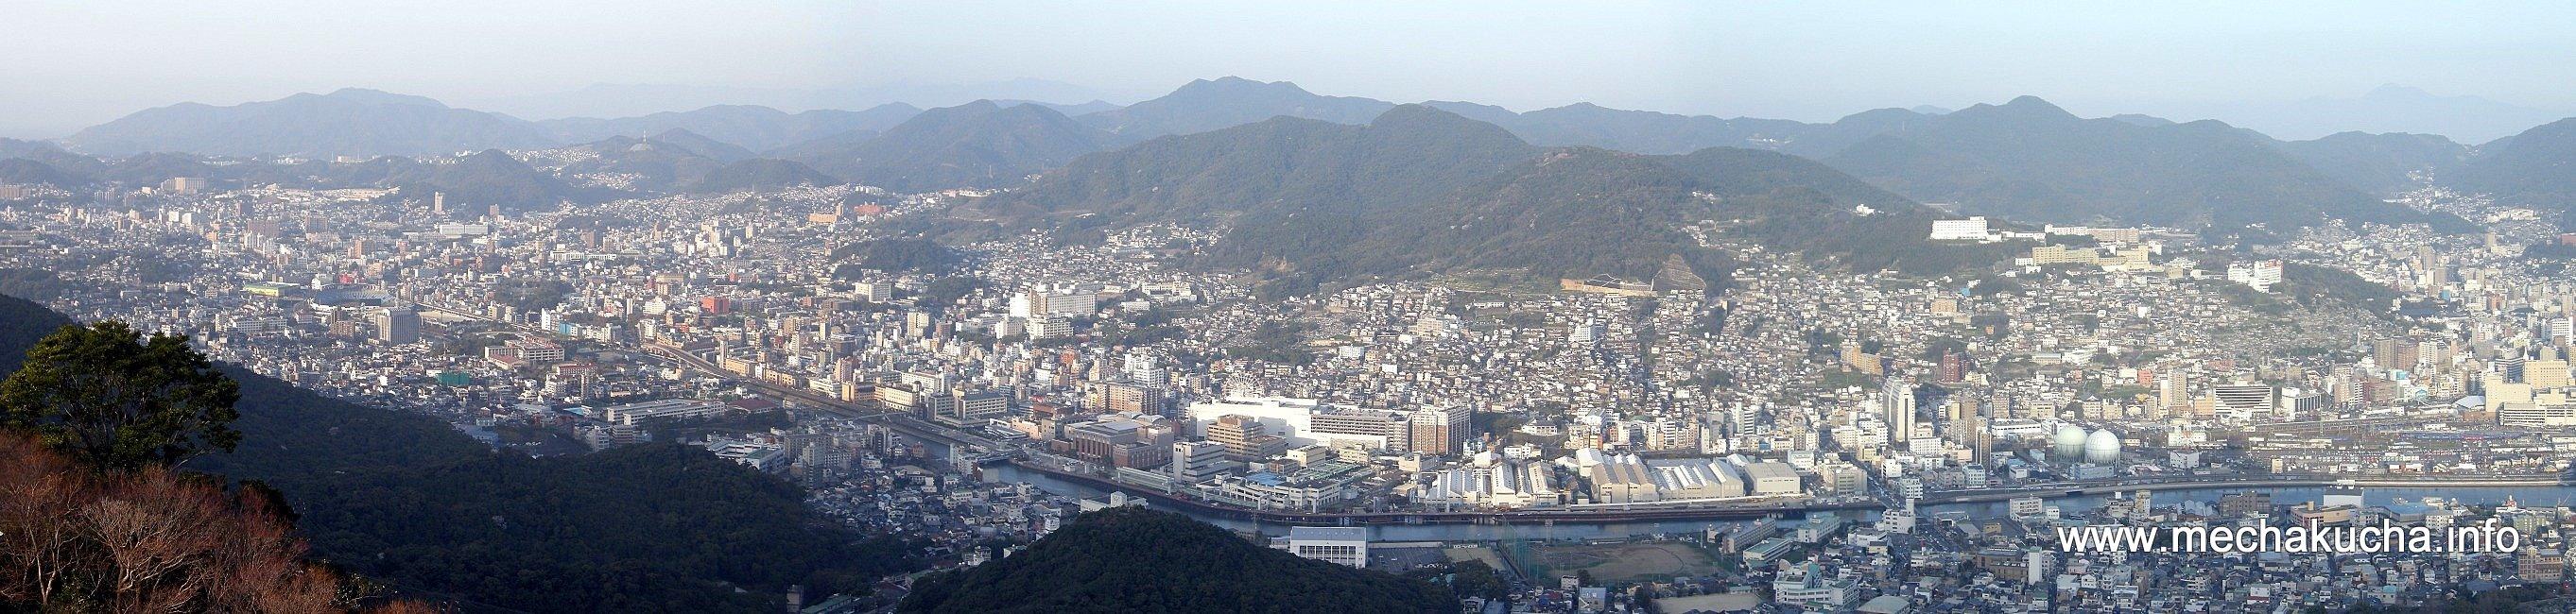 Nagasaki Panorama3